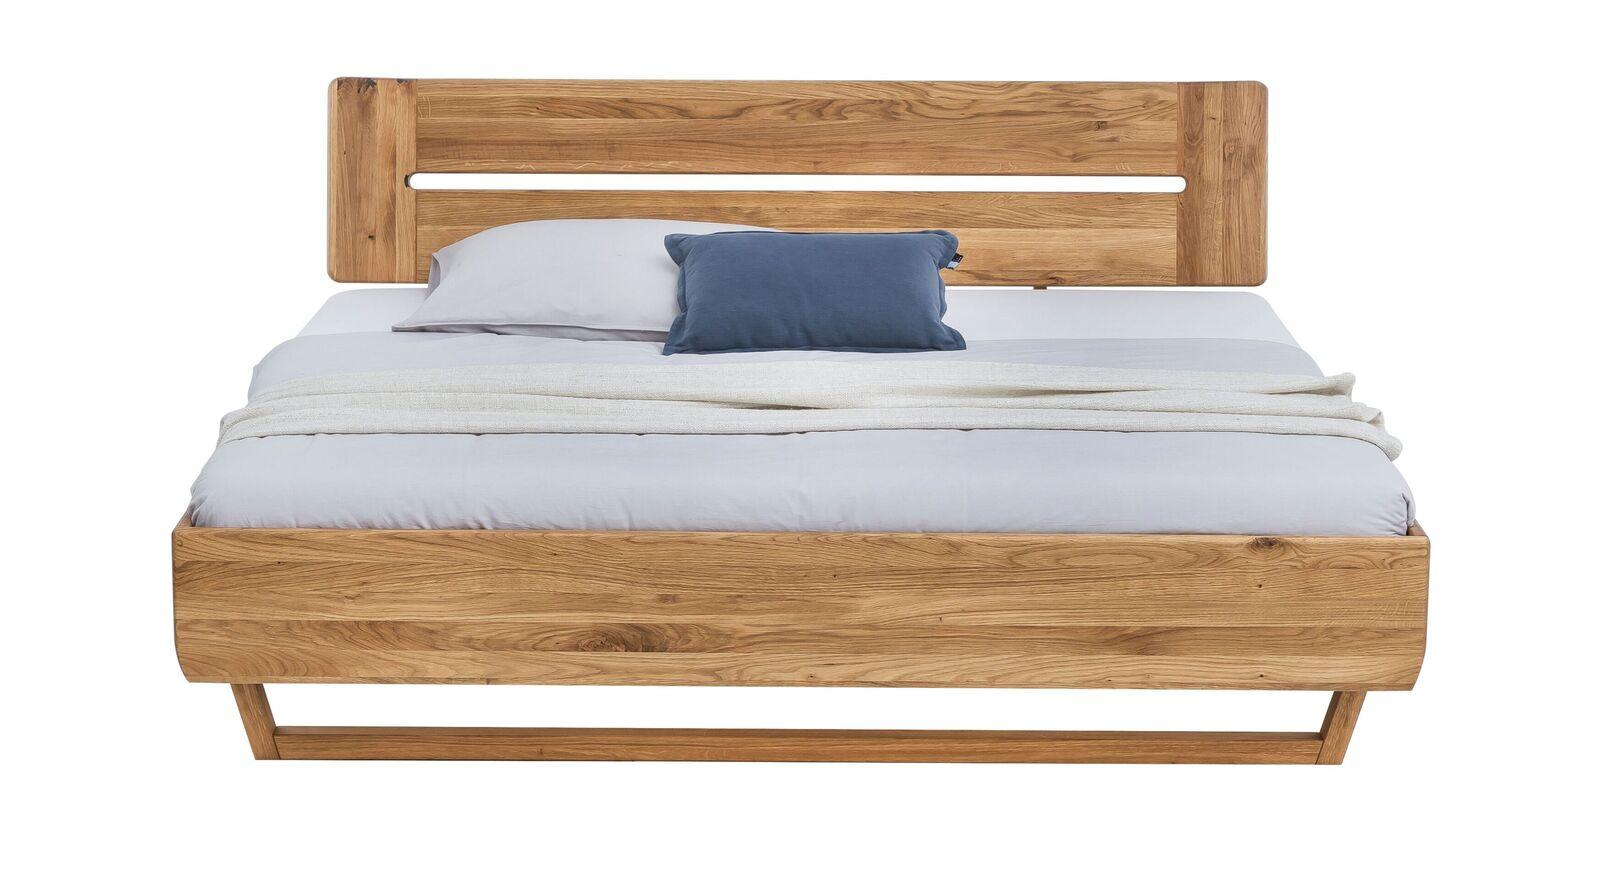 Bett Bekan mit lebendiger Holzmaserung